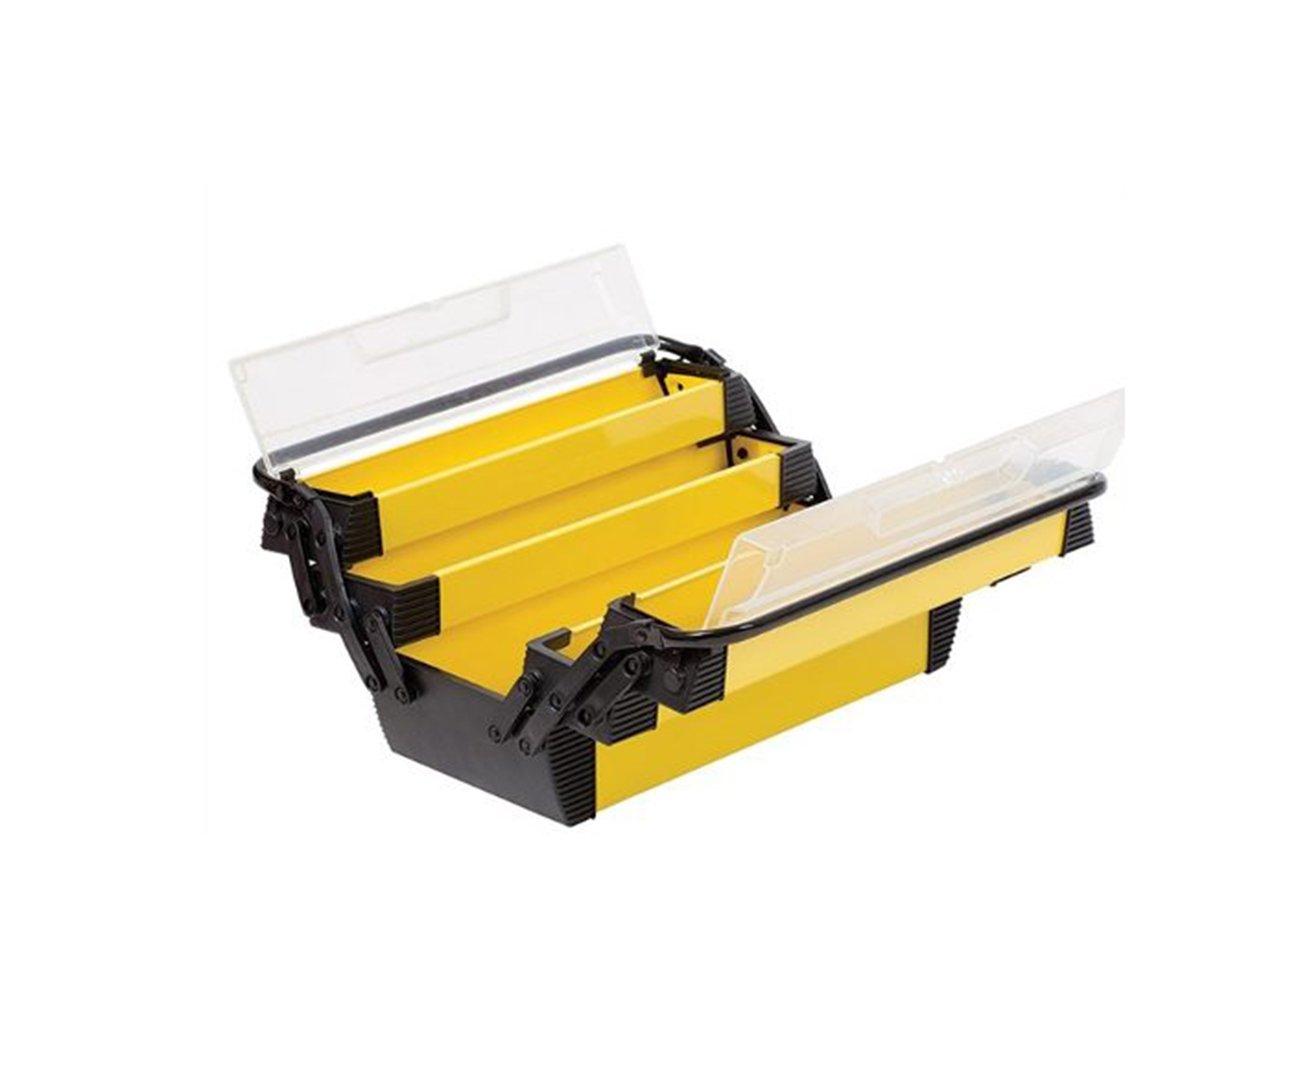 Maleta Ferramenta Guisa Tool Box 515x210x230mm